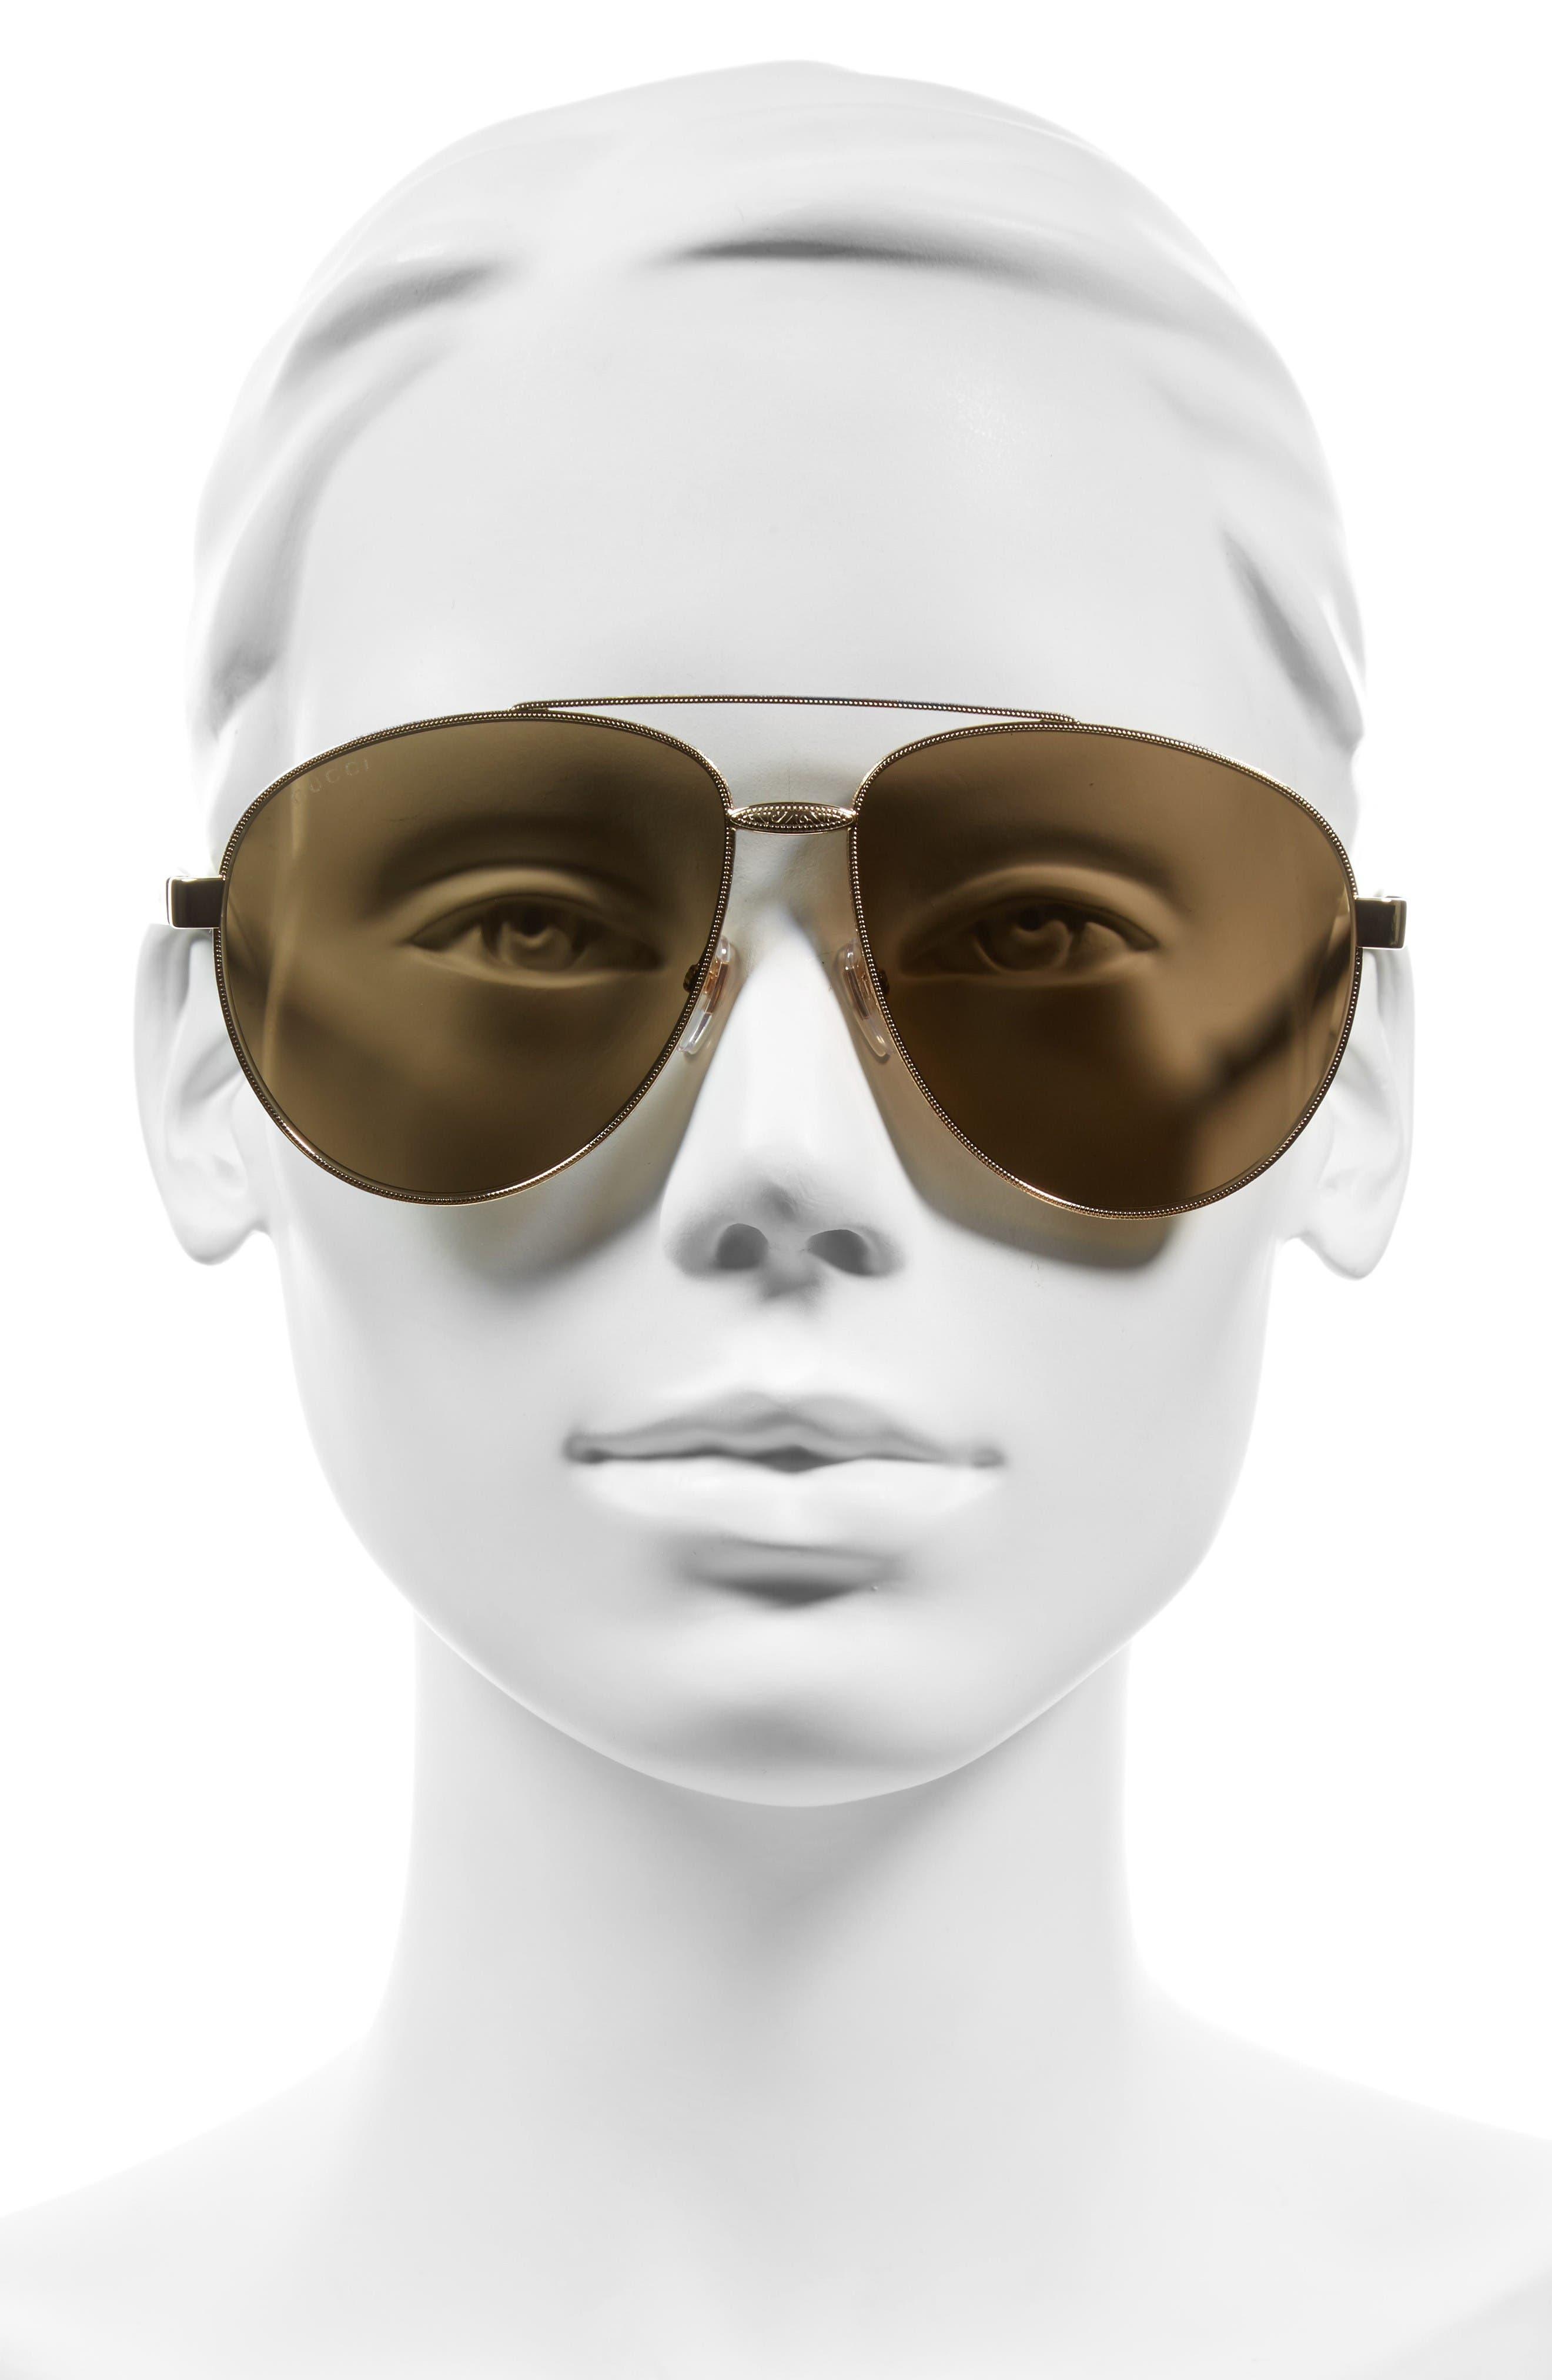 61mm Aviator Sunglasses,                             Alternate thumbnail 2, color,                             Gold/ Brown